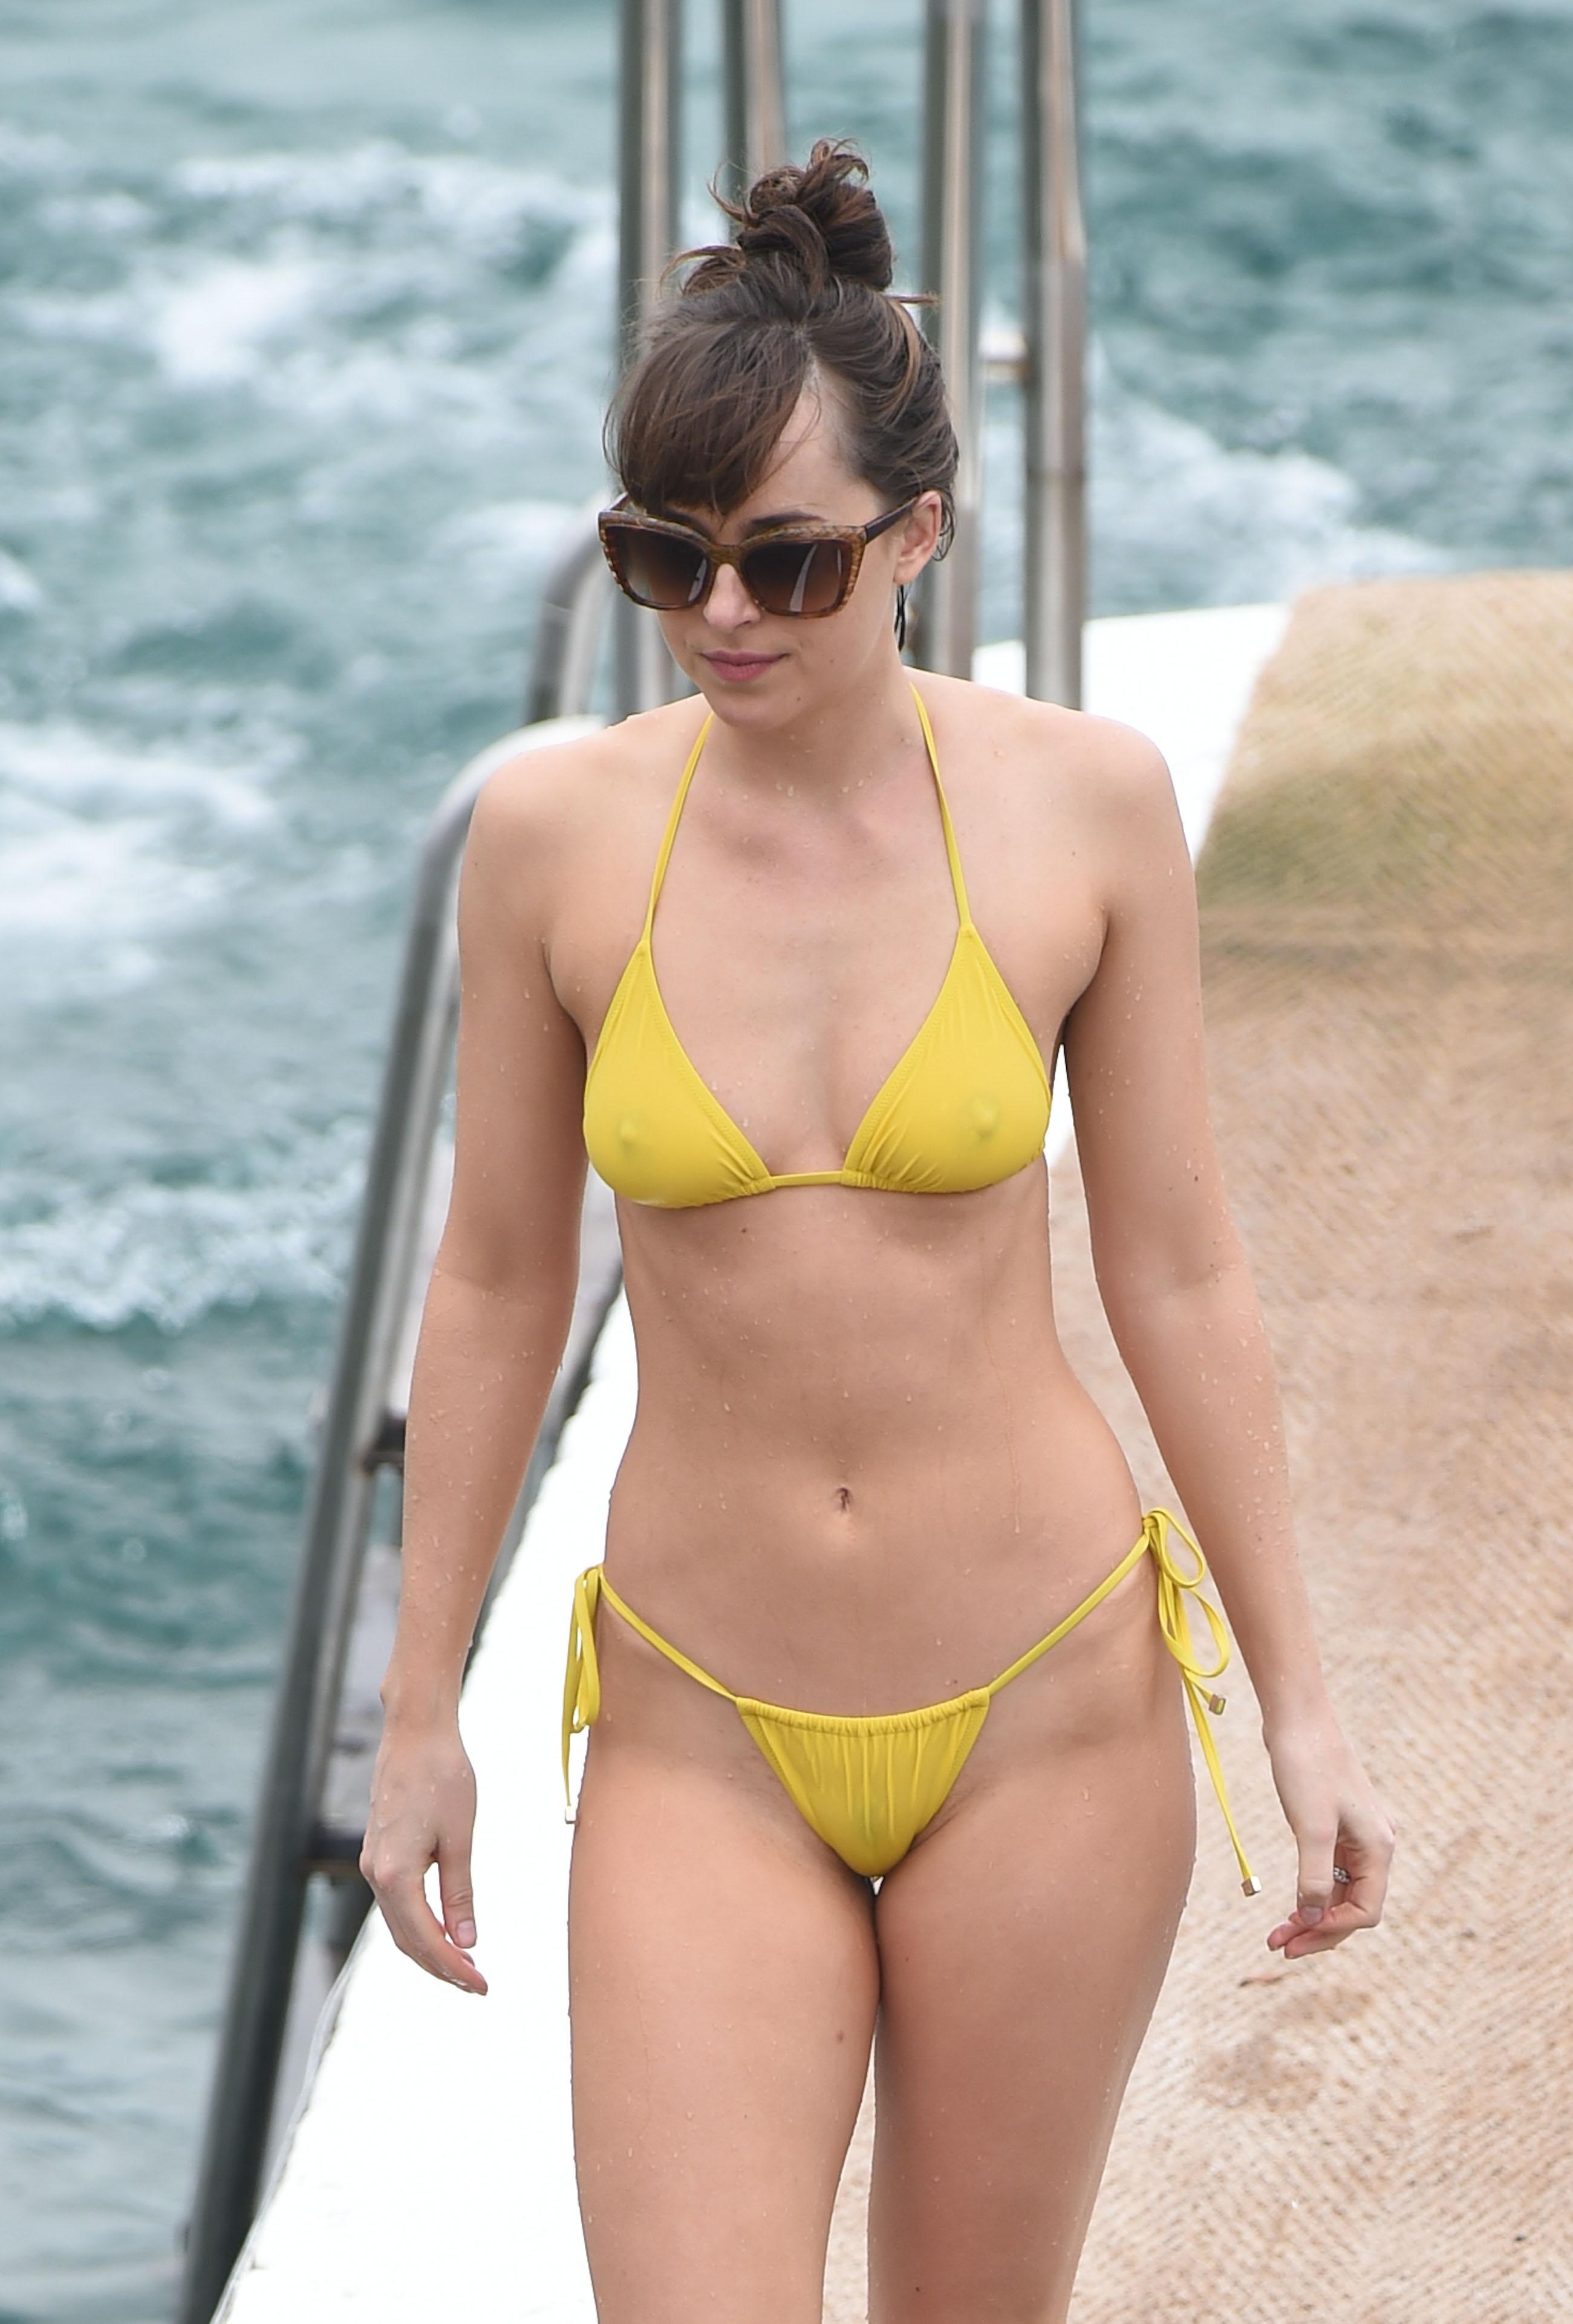 dakota-johnson-topless-cameltoe-see-through-in-bikini-25 ...